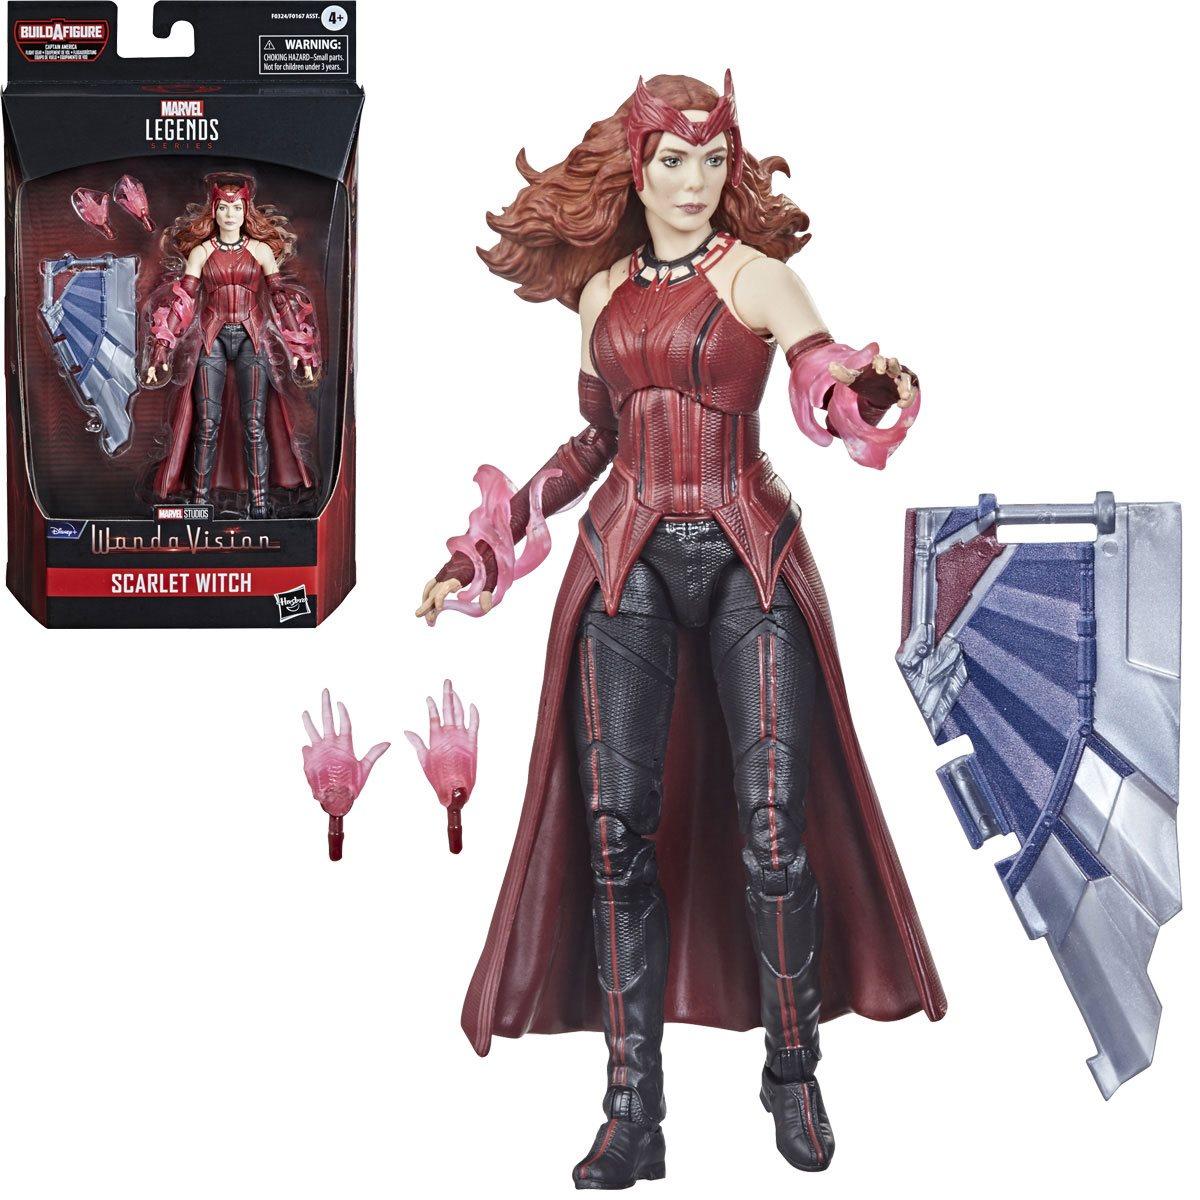 Marvel Legends Scarlet Witch 6 Inch Action Figure. Build-A-Figure Cap America Flight Gear.